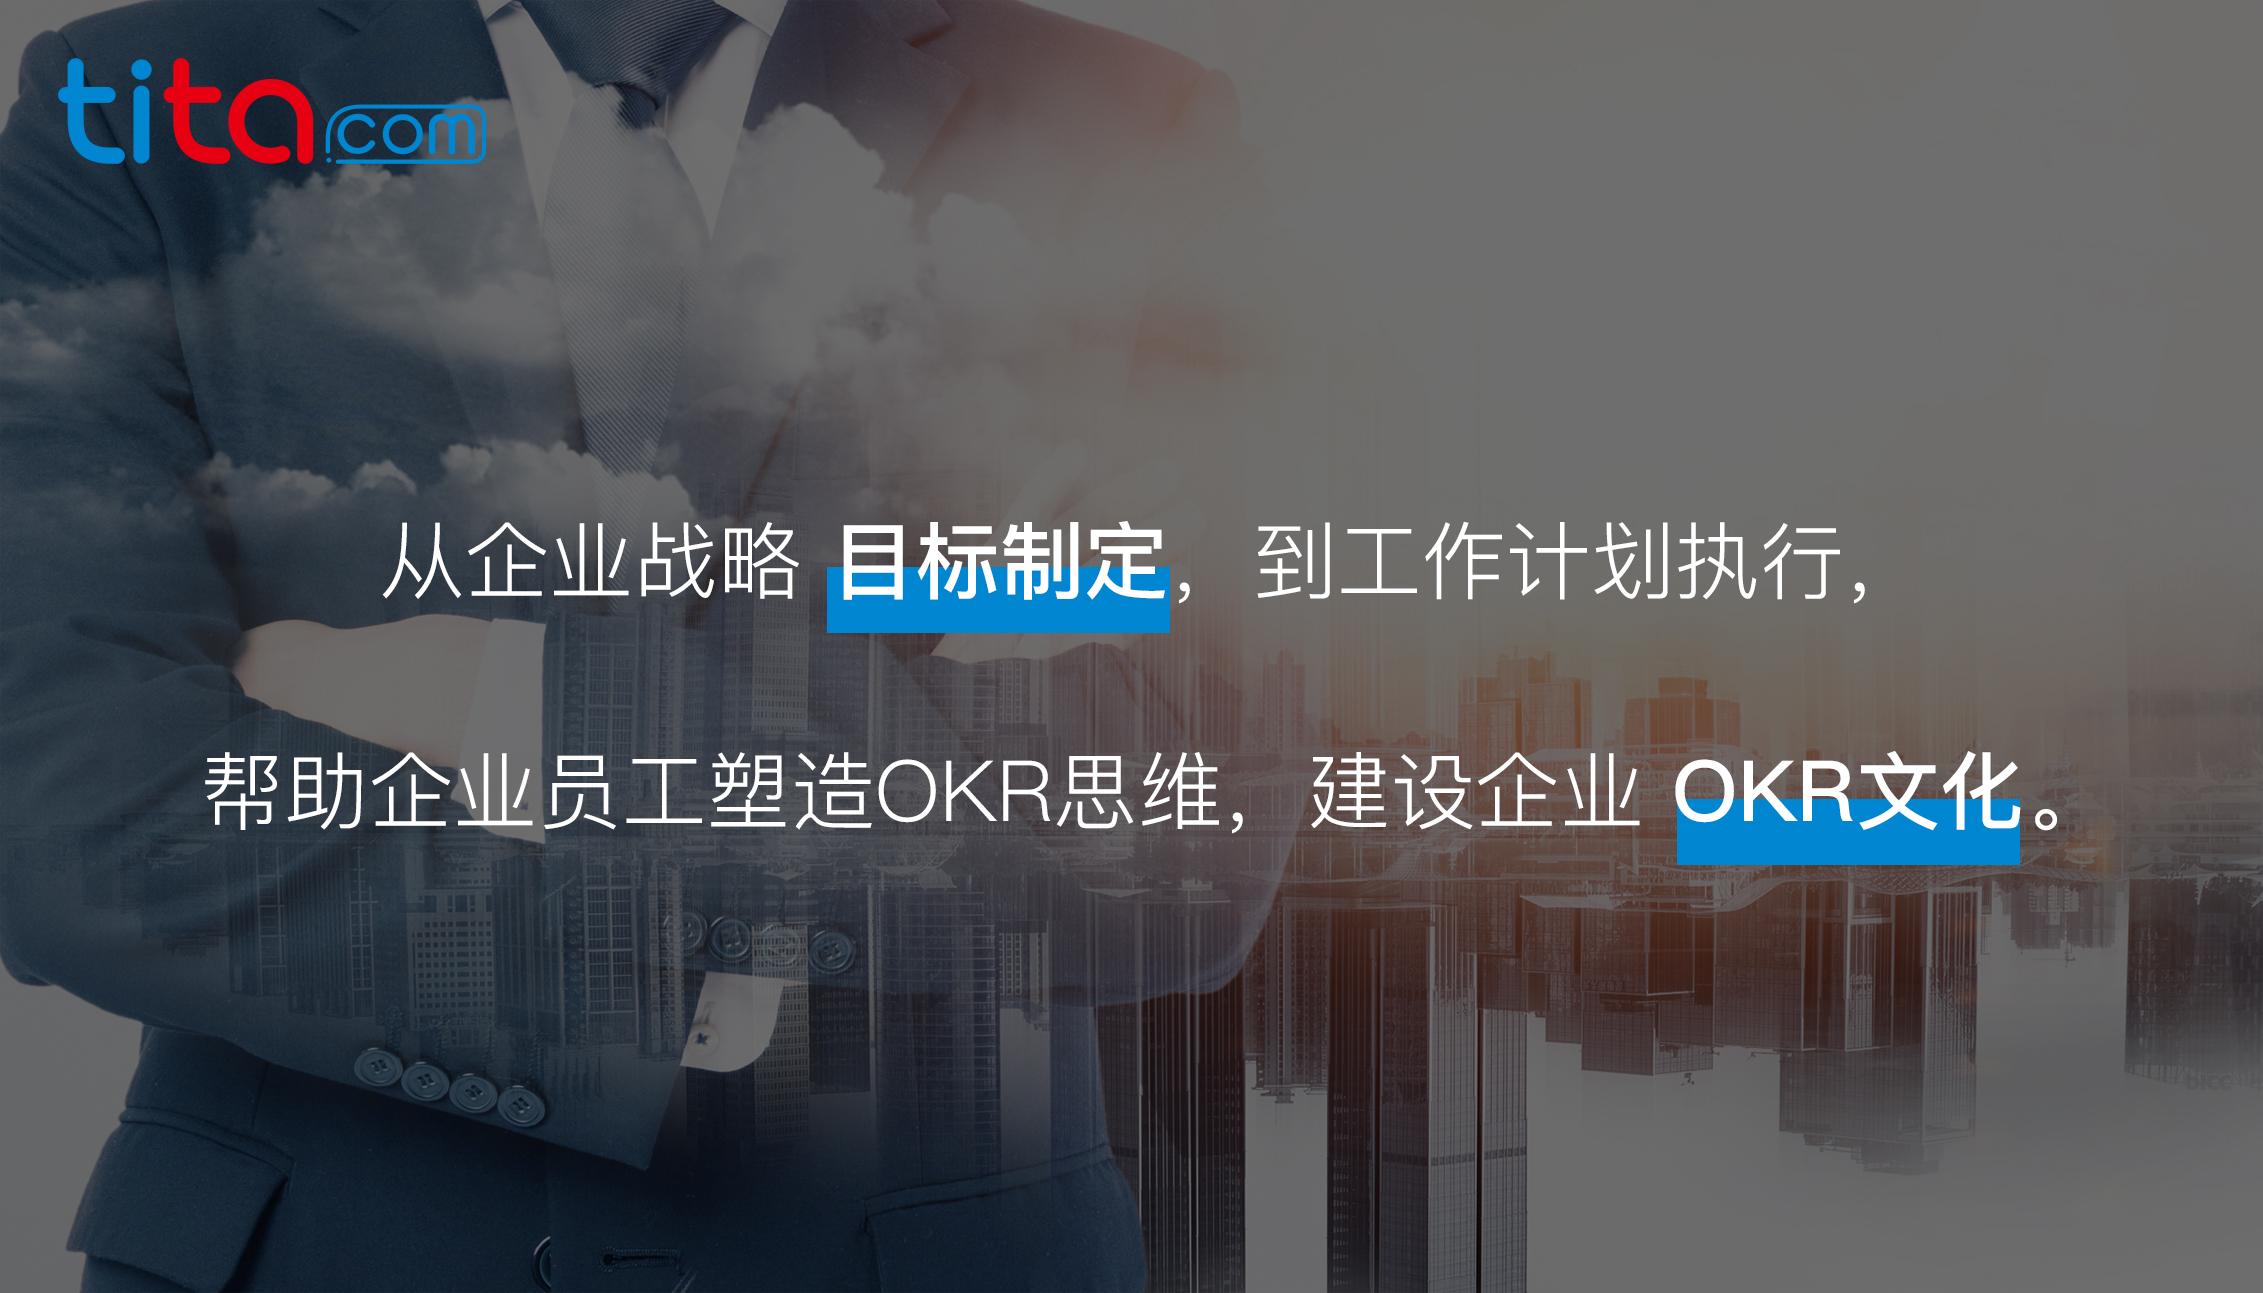 OKR示例